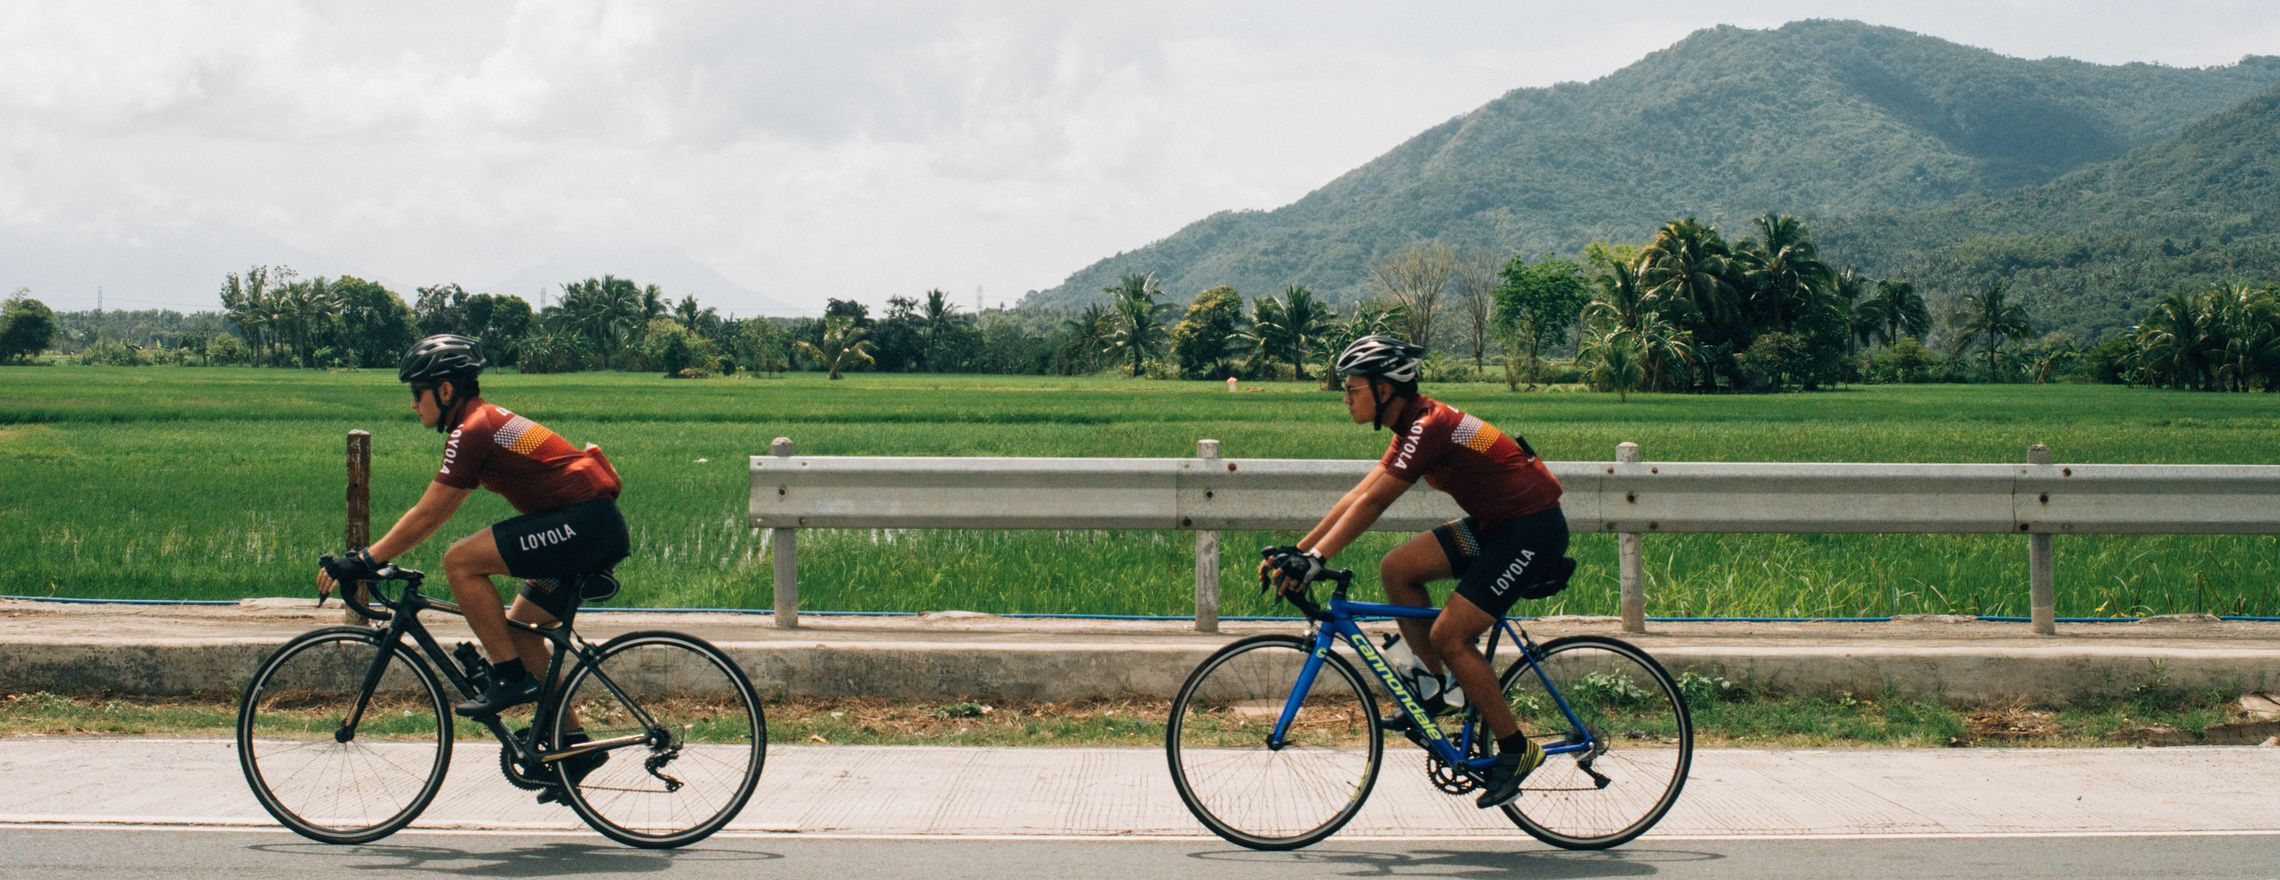 Team Loyola Mission Ride To Caliraya Laguna Philippines Cycling Cycle Roadbike Teamloyola Ride Ciclo P Cycling Photography Cycling University Student